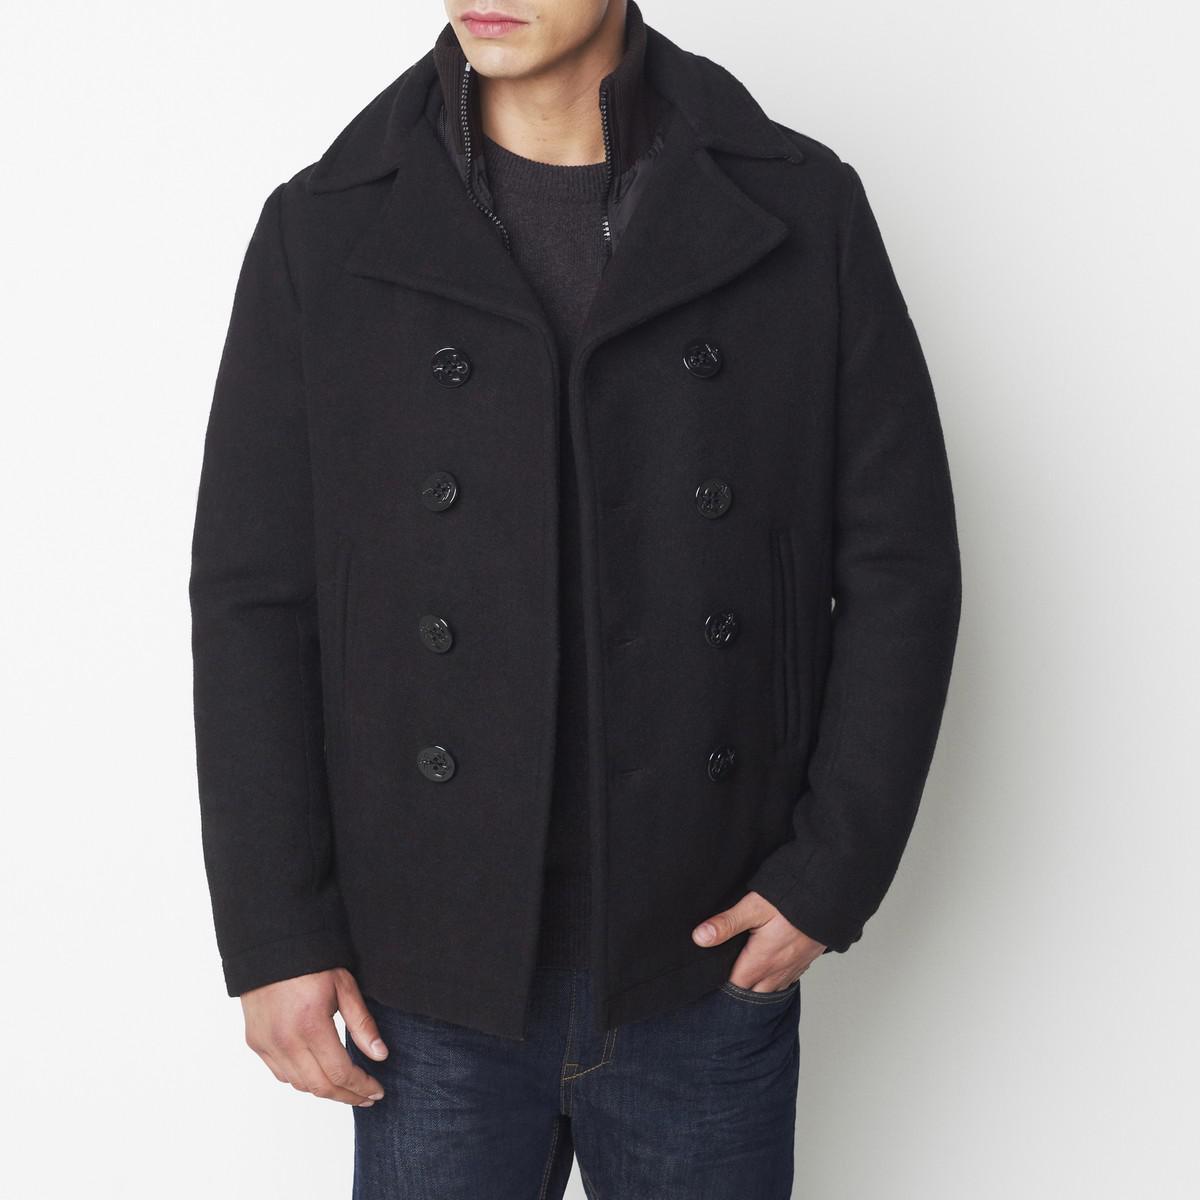 schott nyc 2 in 1 effect pea coat in black for men save. Black Bedroom Furniture Sets. Home Design Ideas